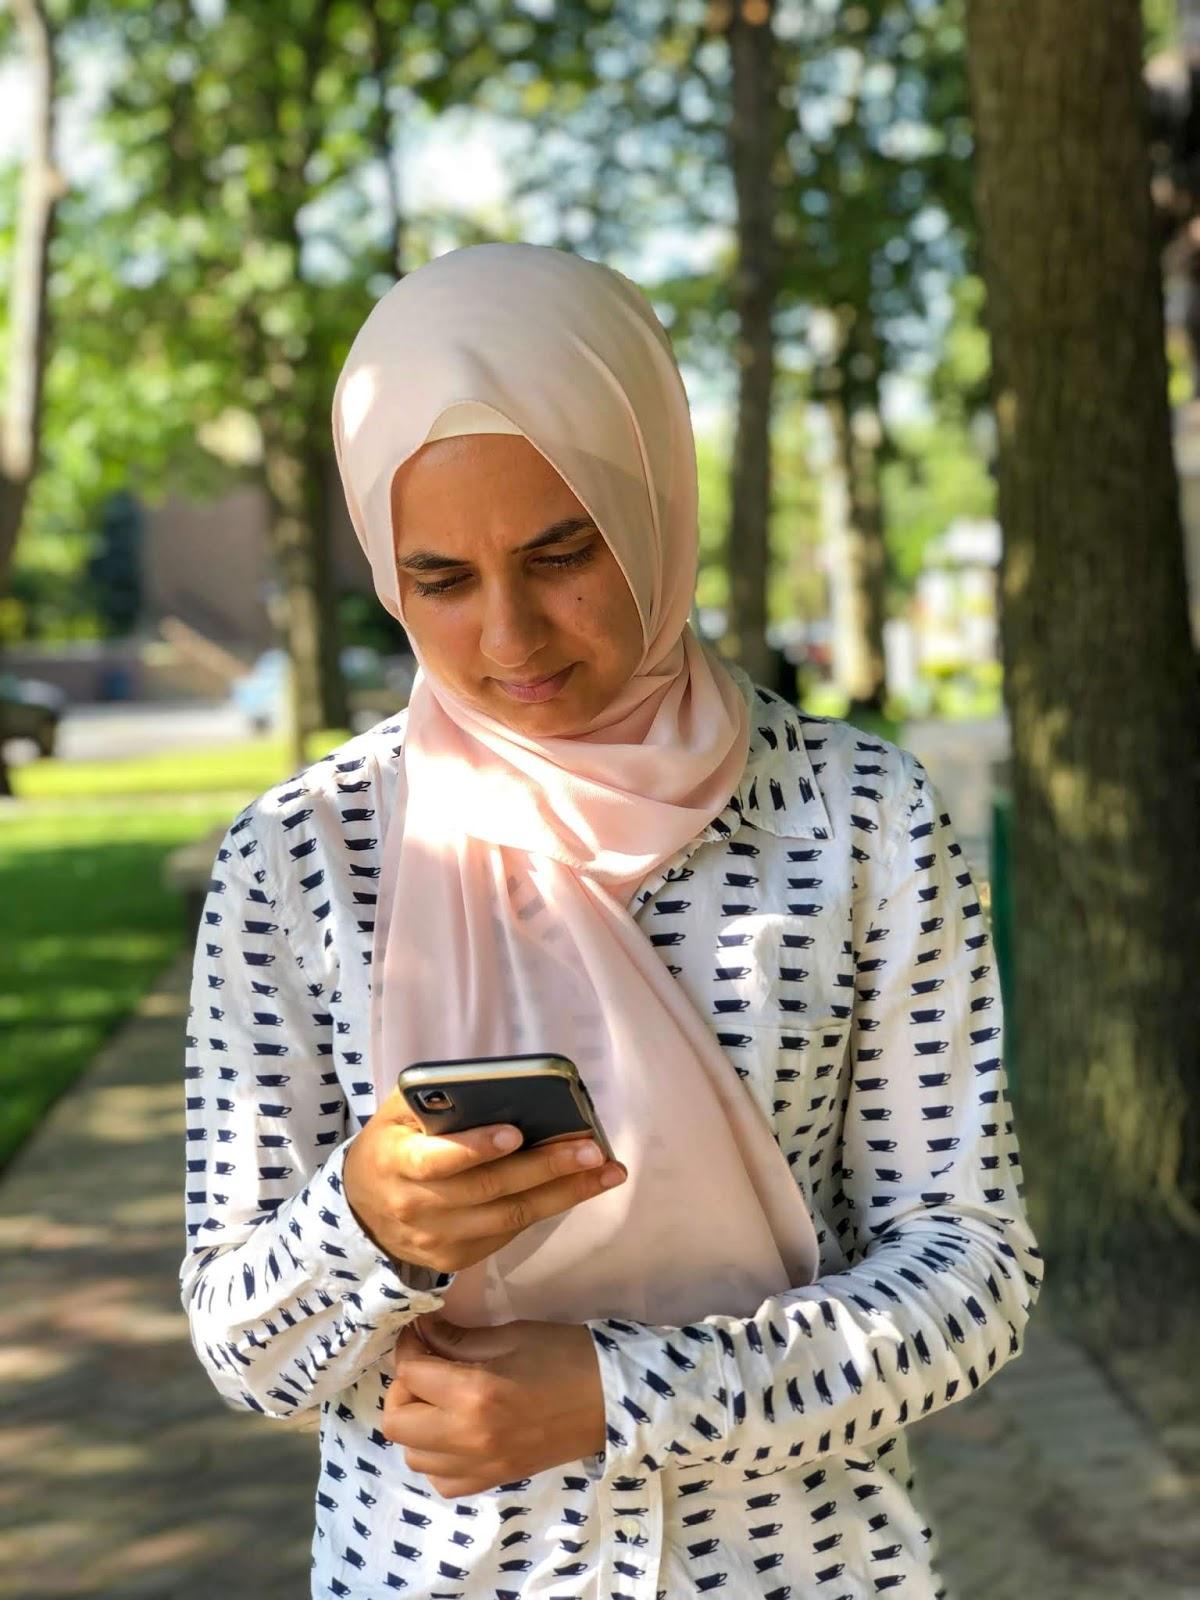 Sahara focusing on her phone on social media